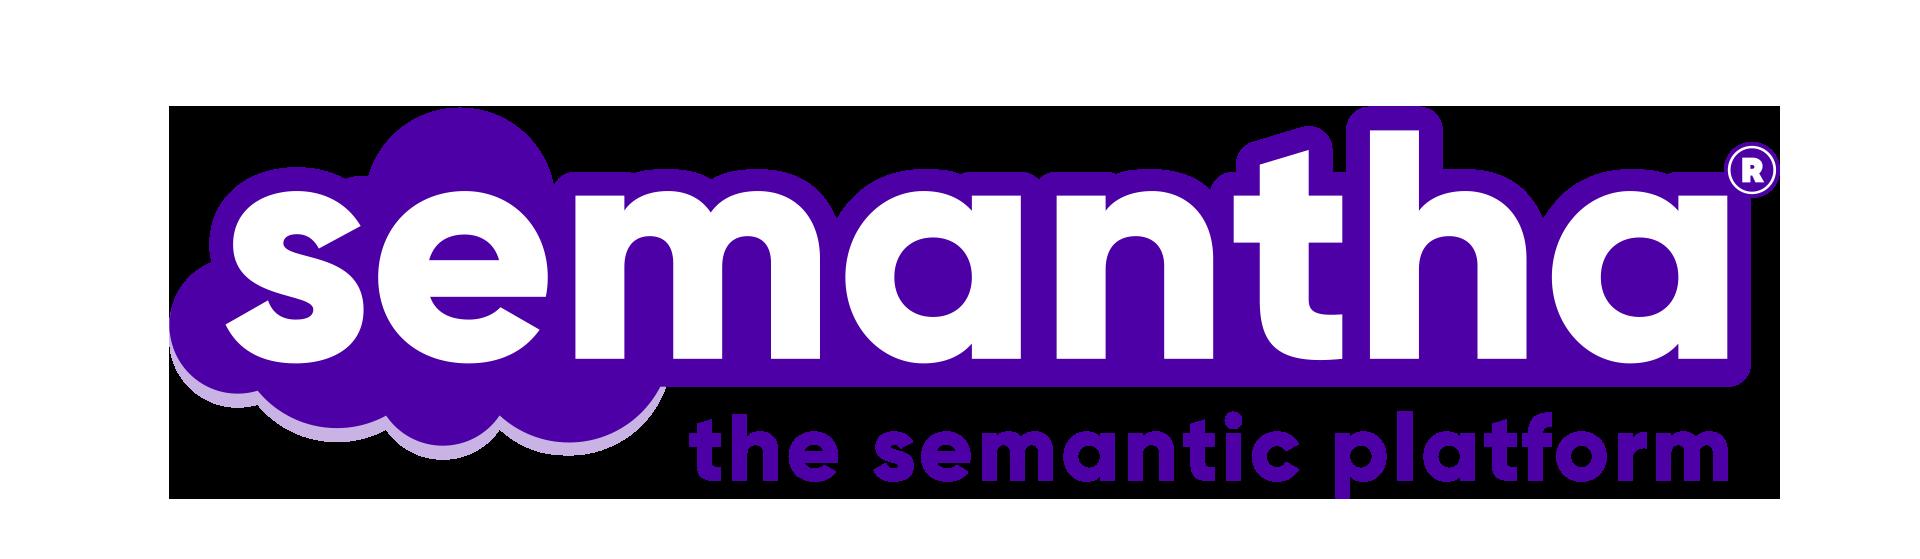 semantha logo